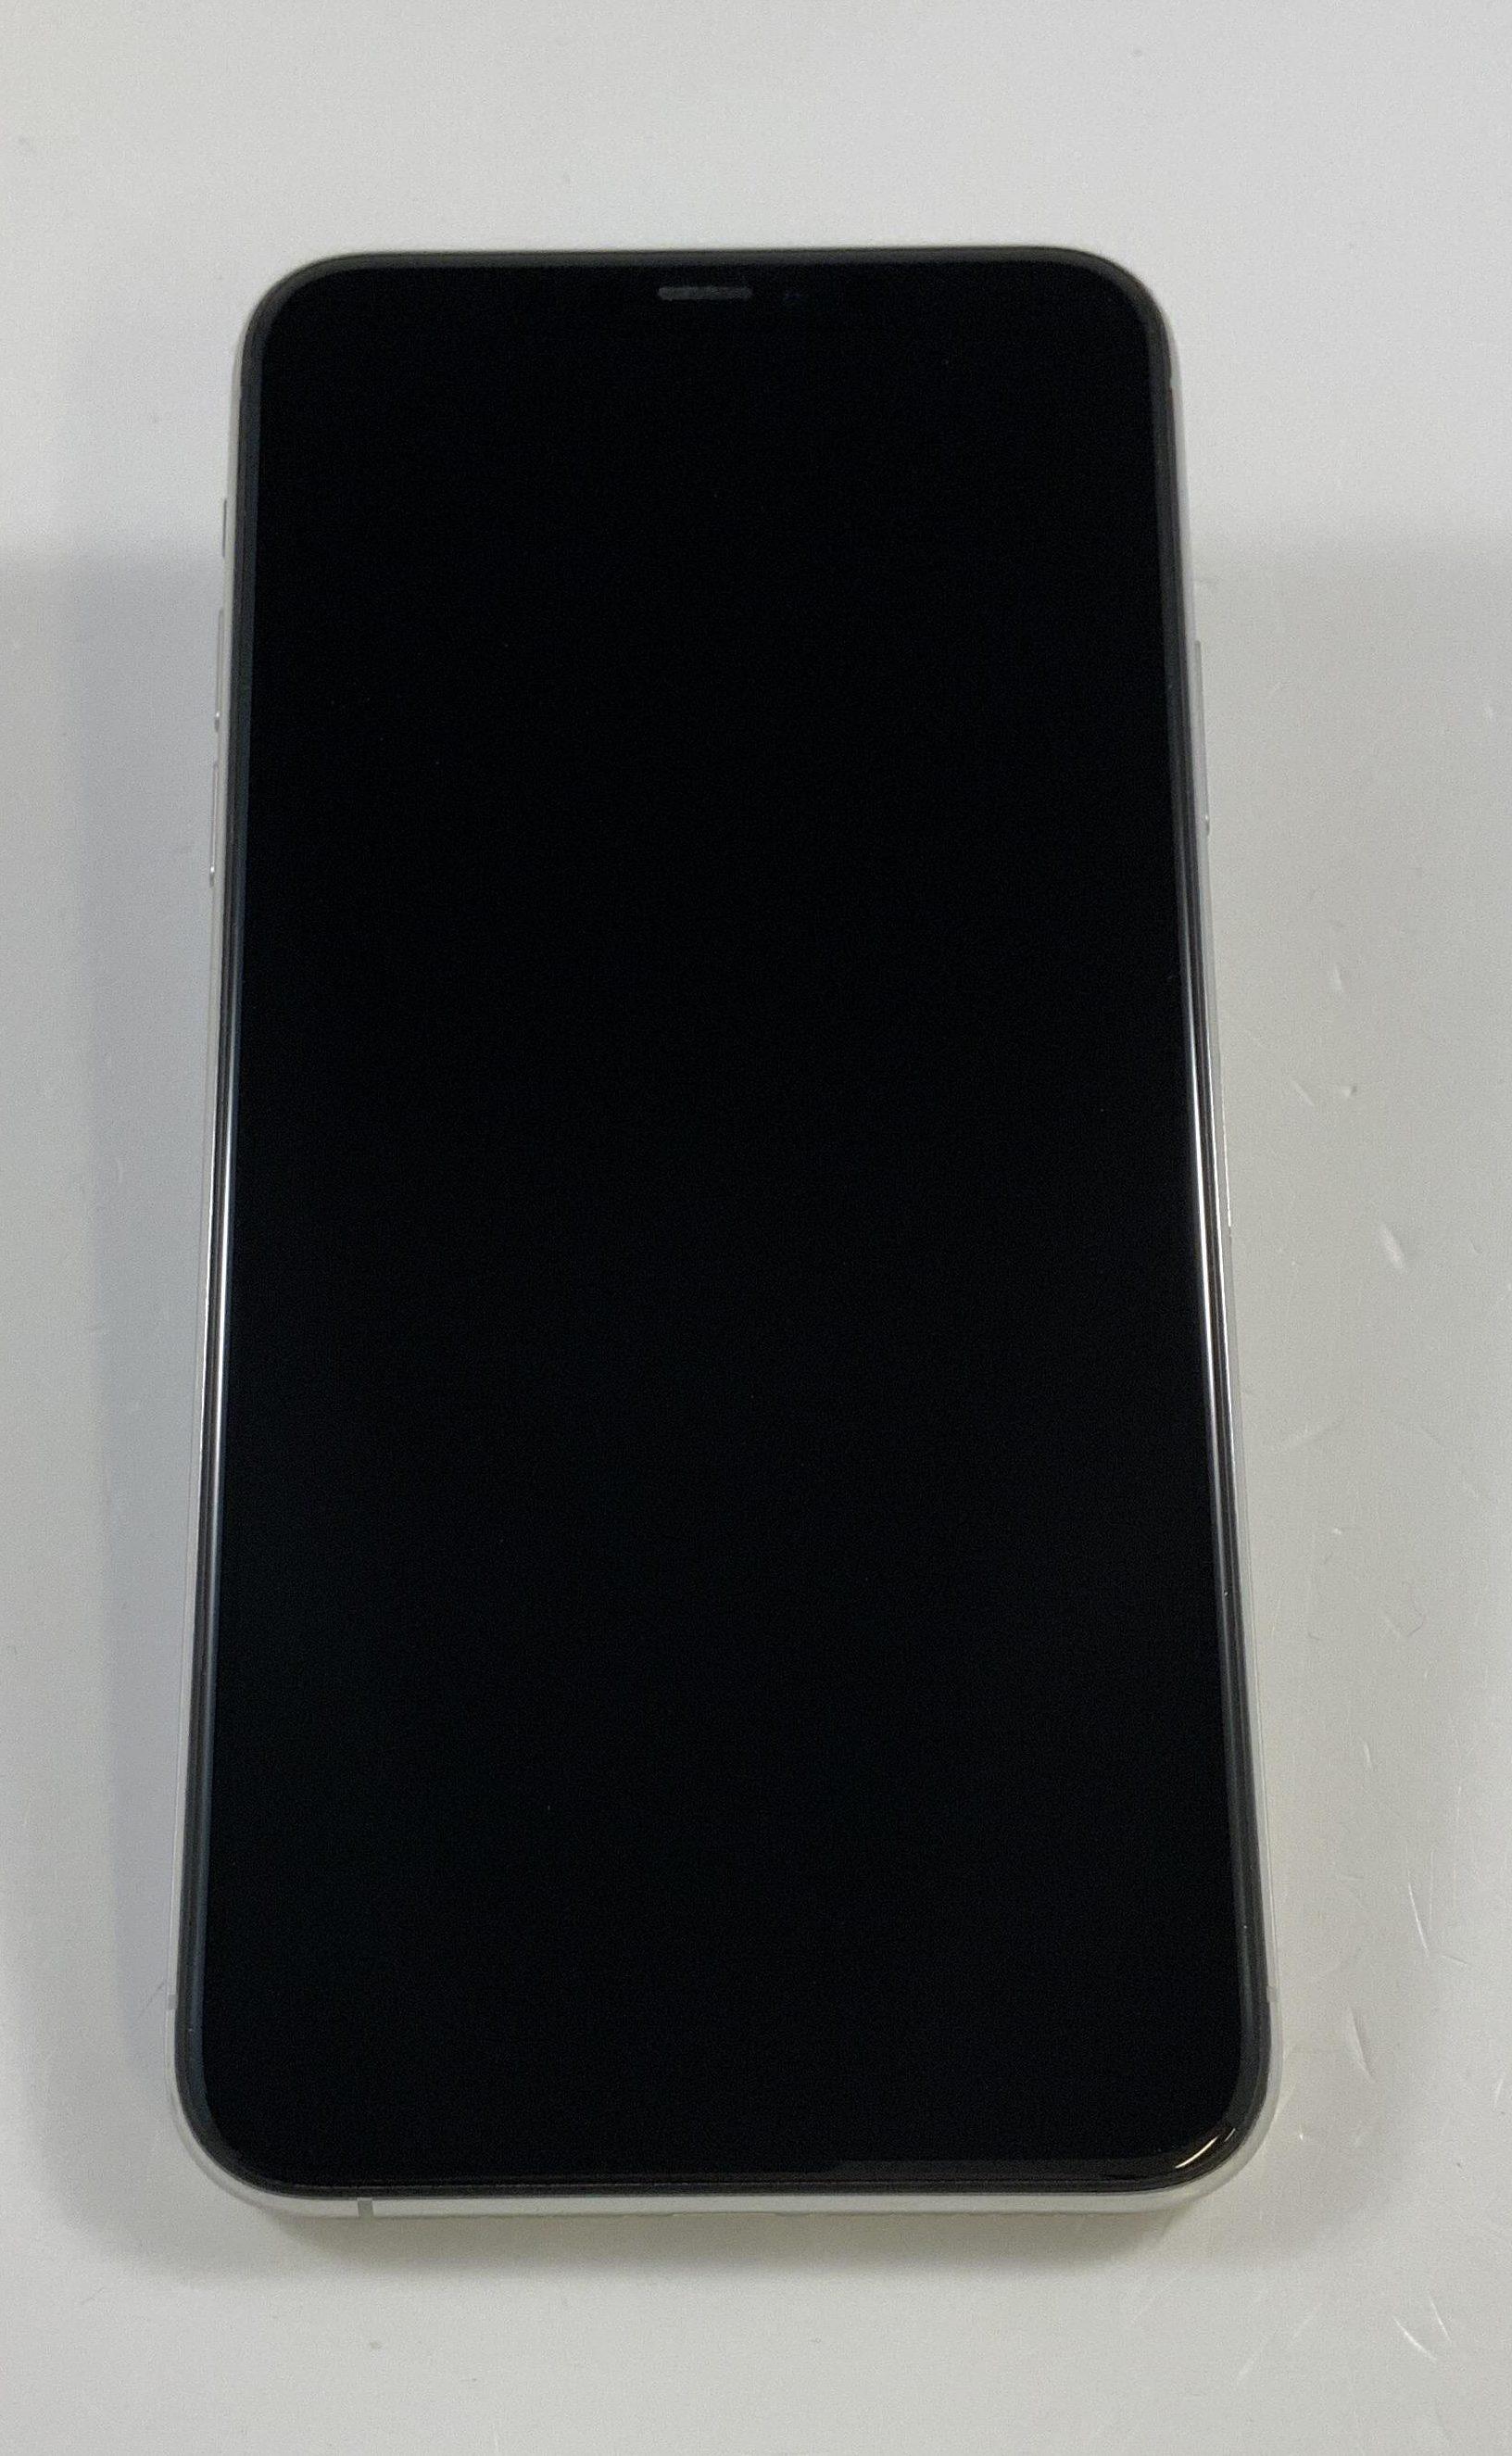 iPhone 11 Pro Max 64GB, 64GB, Silver, Afbeelding 1